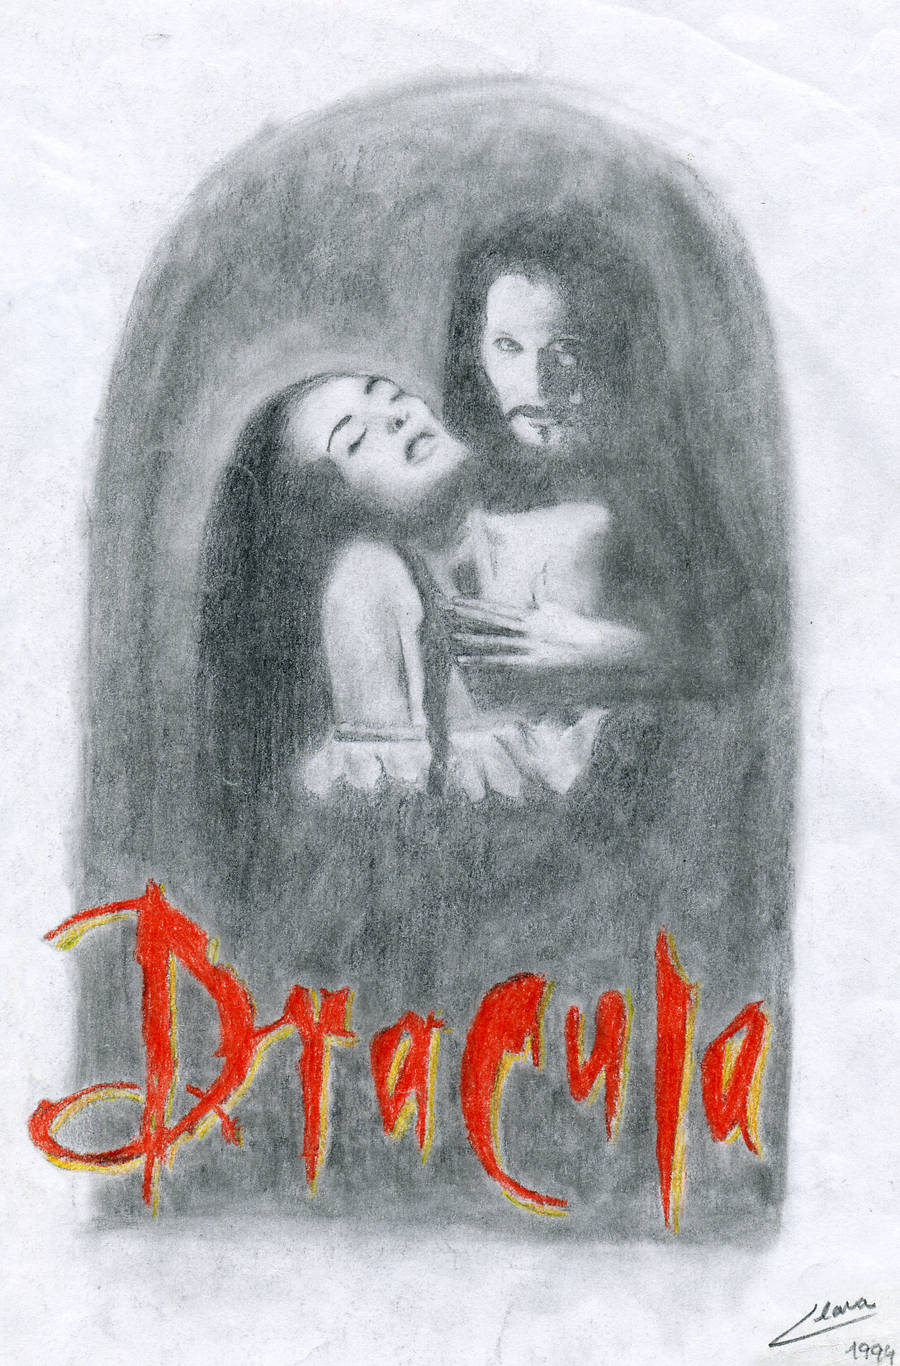 Dracula by ClaraDarko